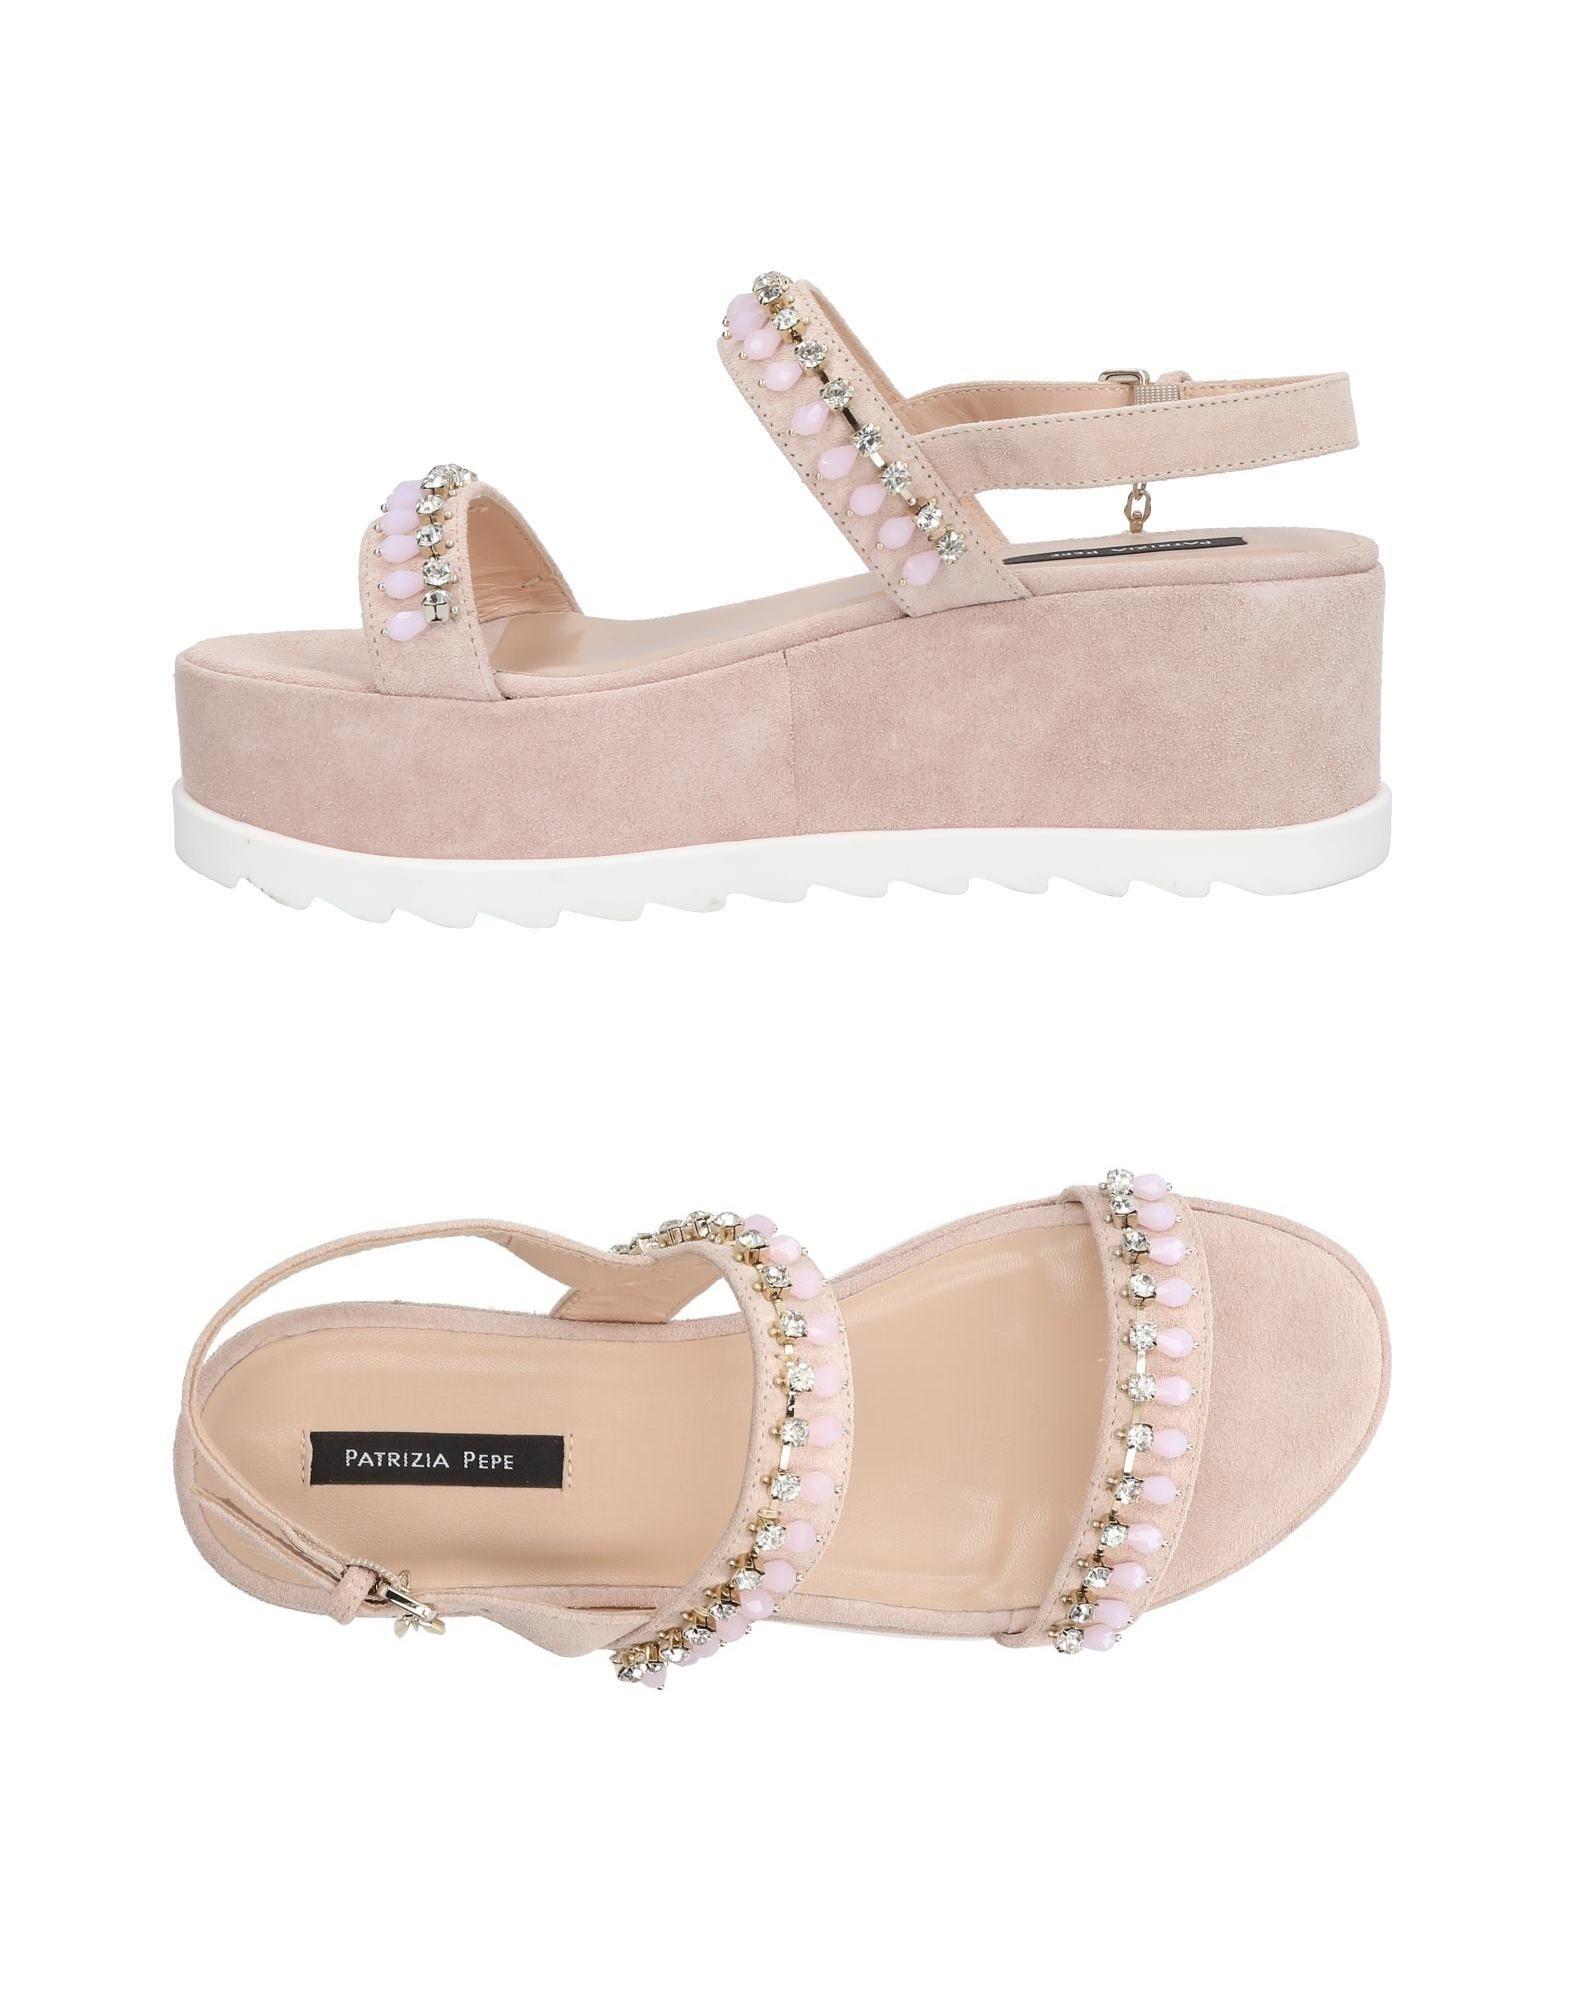 Stilvolle billige Schuhe Patrizia Pepe Sandalen Damen  11432833MR